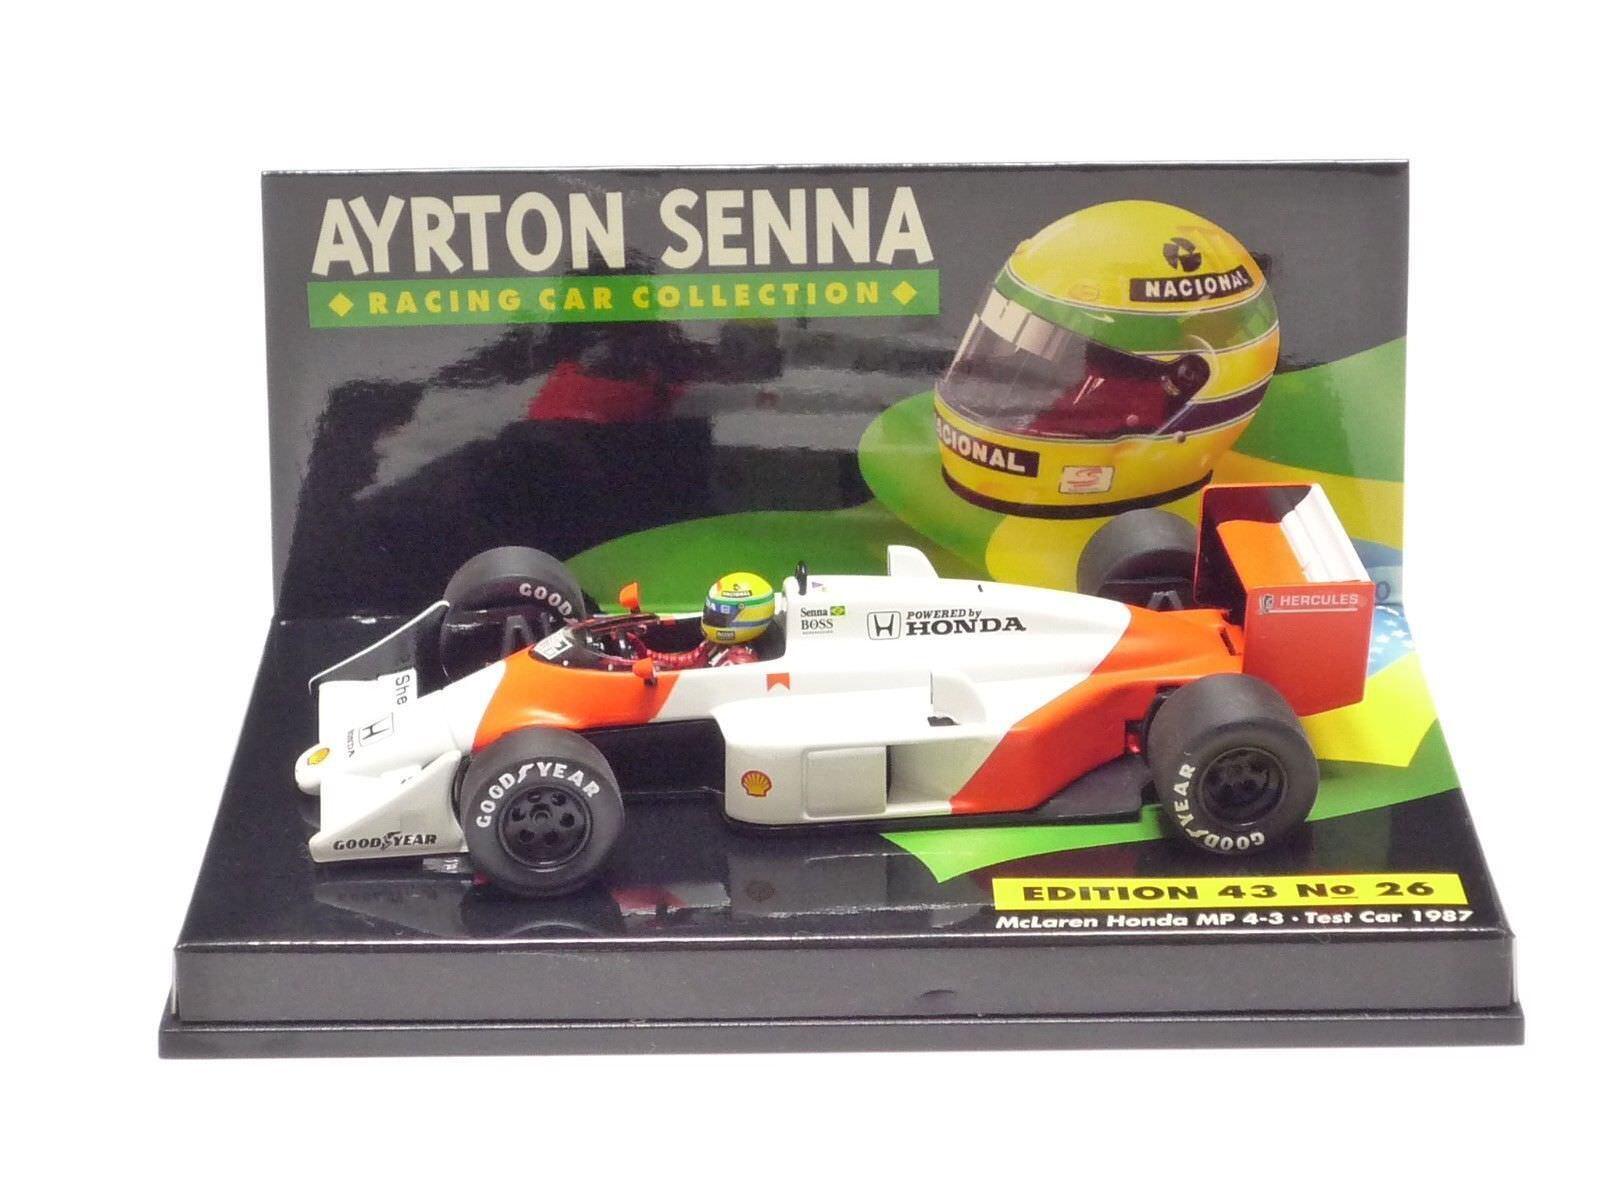 Minichamps 1 43 McLaren Honda MP4 3 test car 1987 Ayrton Senna collection n.26